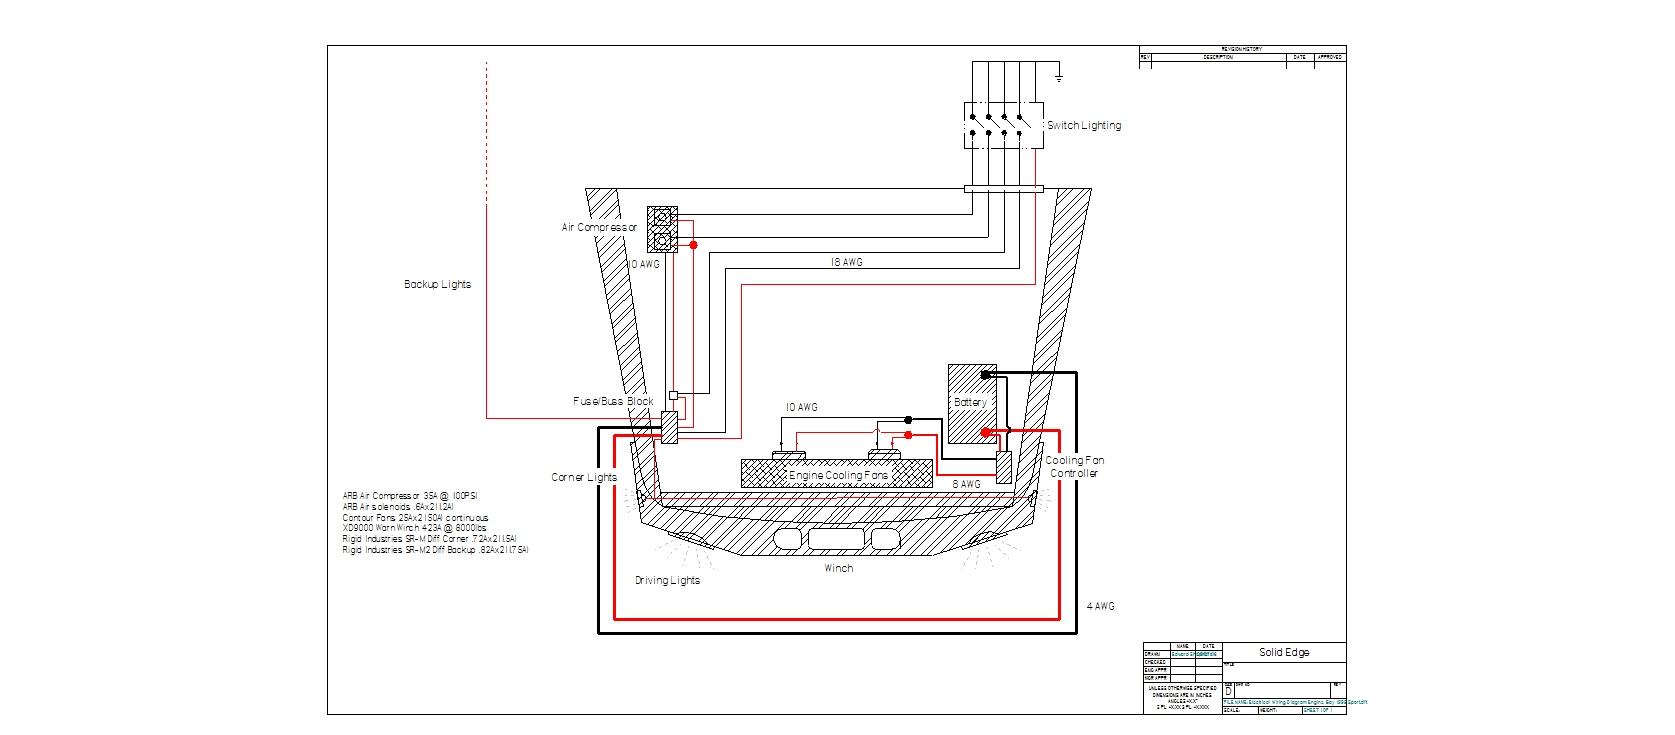 Hotsy Wiring Diagram | Repair Manual on